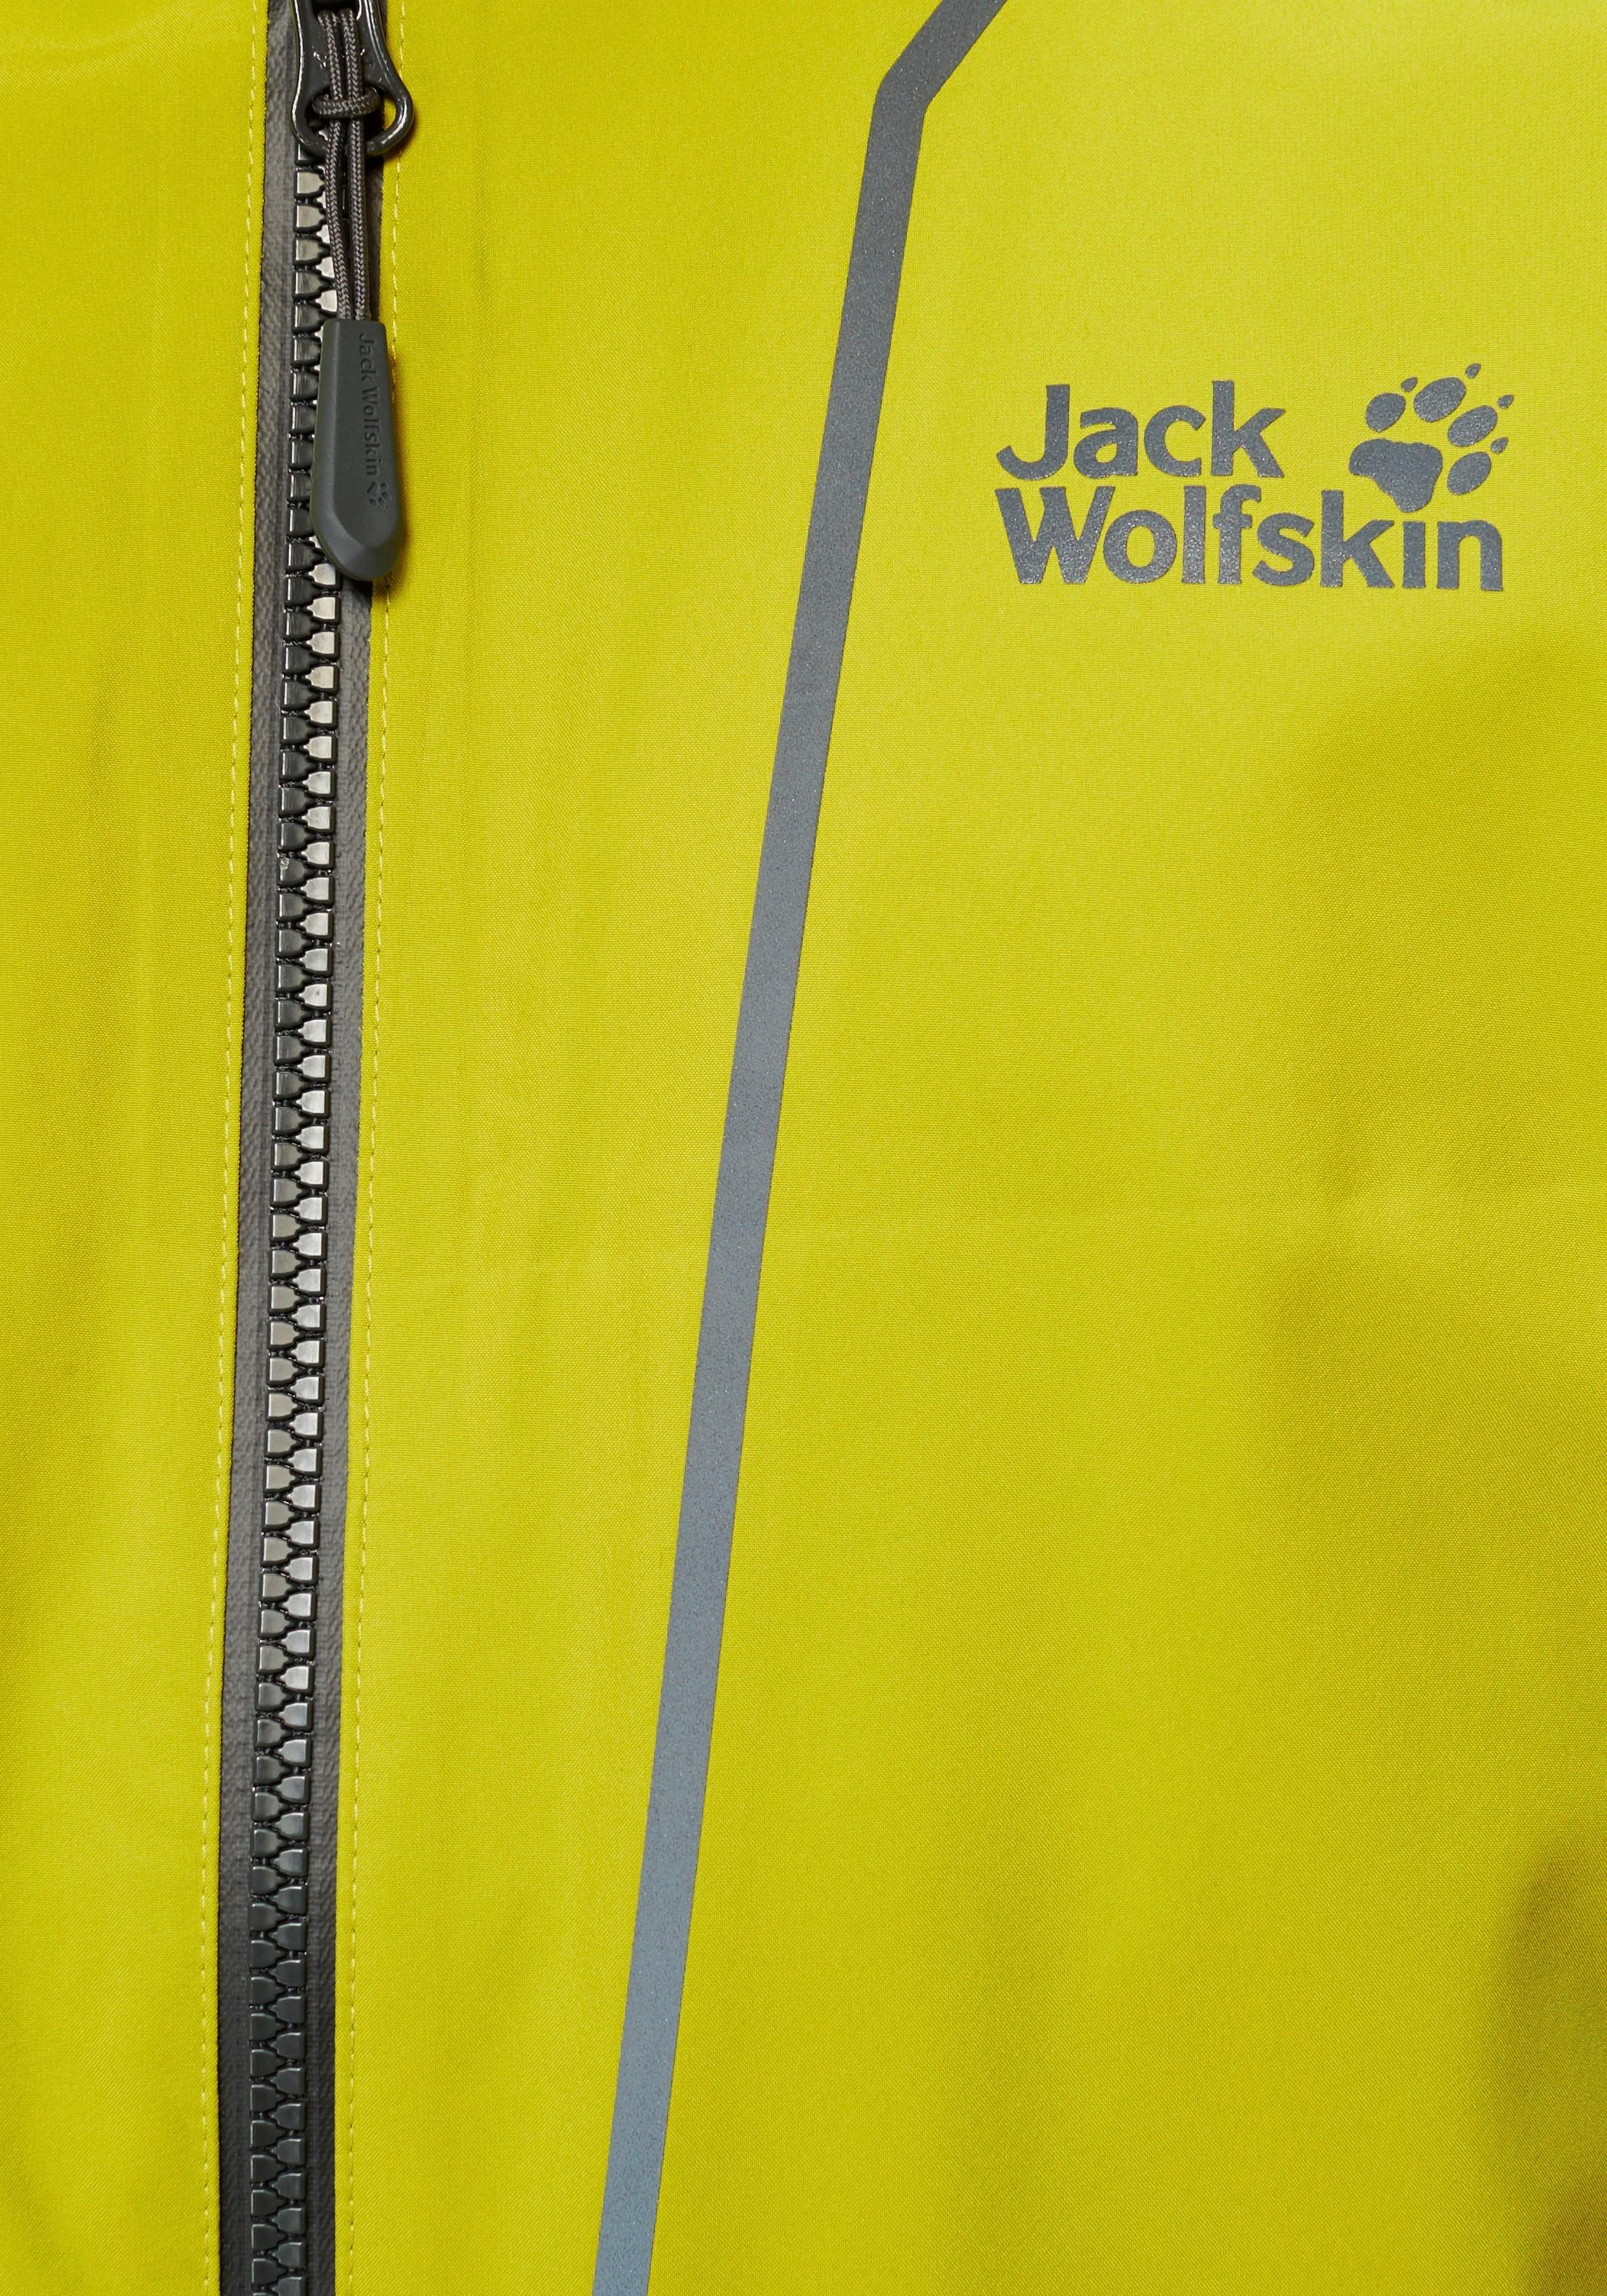 Jack Jacksierra Snel Wolfskin Functioneel Trail Gevonden 29IDHeWEY